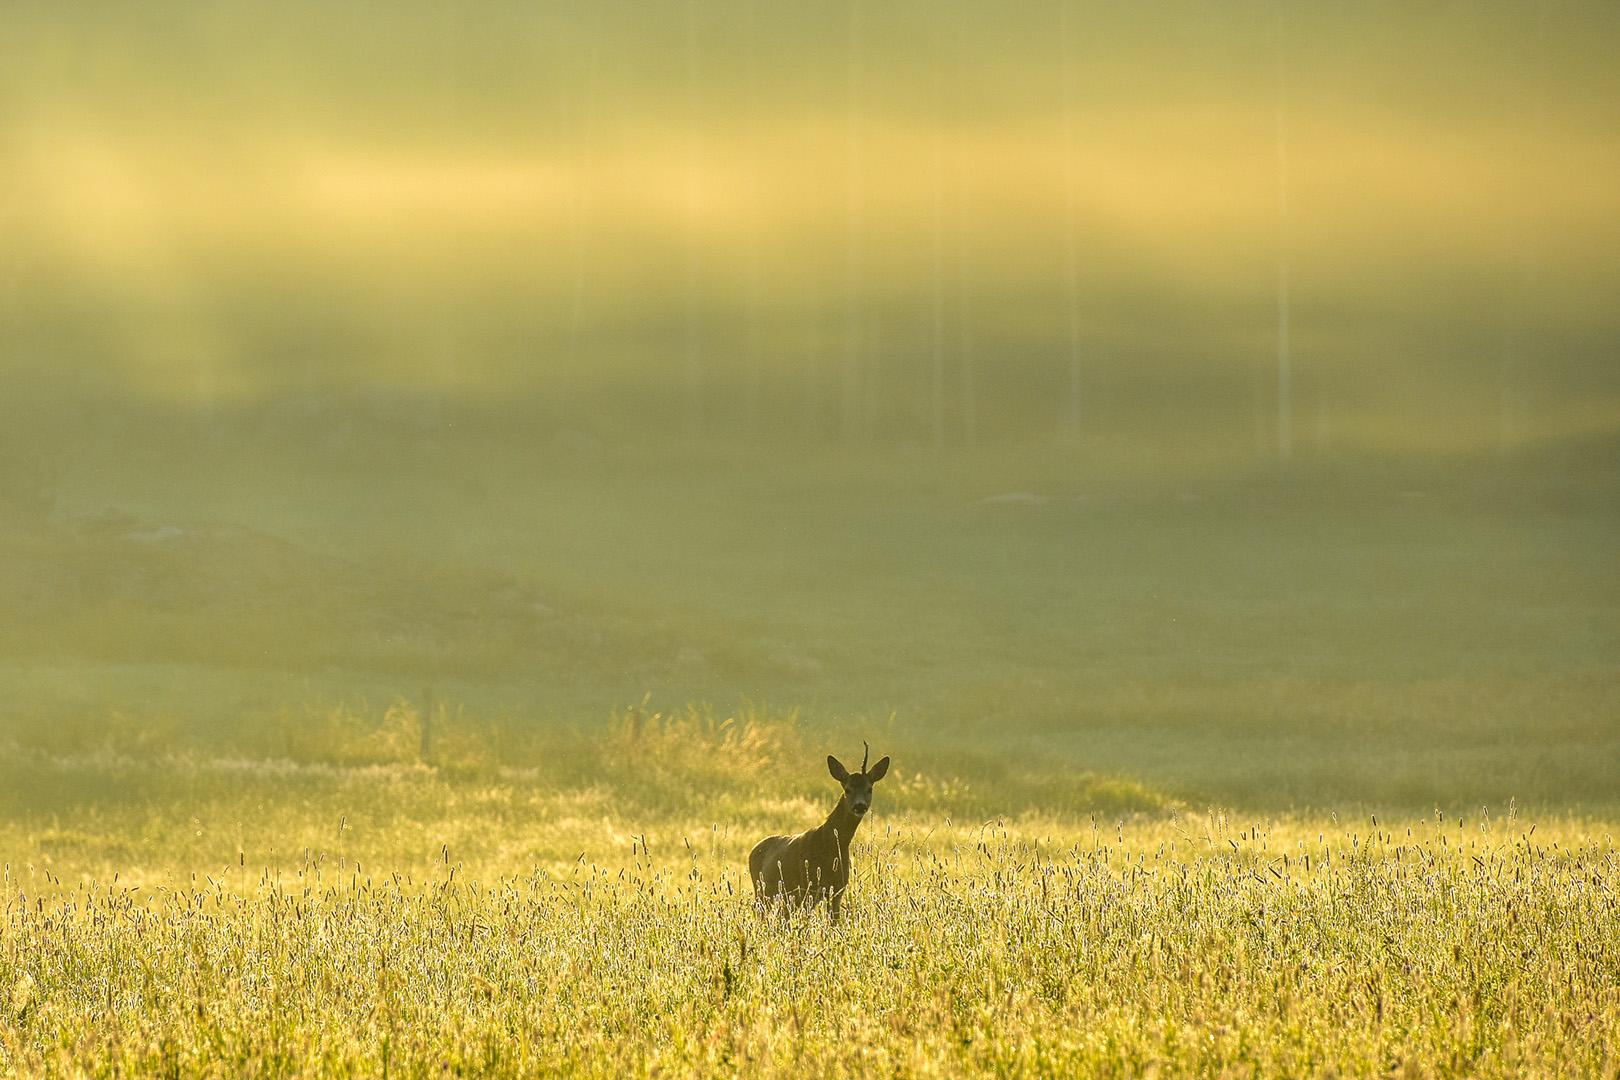 Gyllene dimma